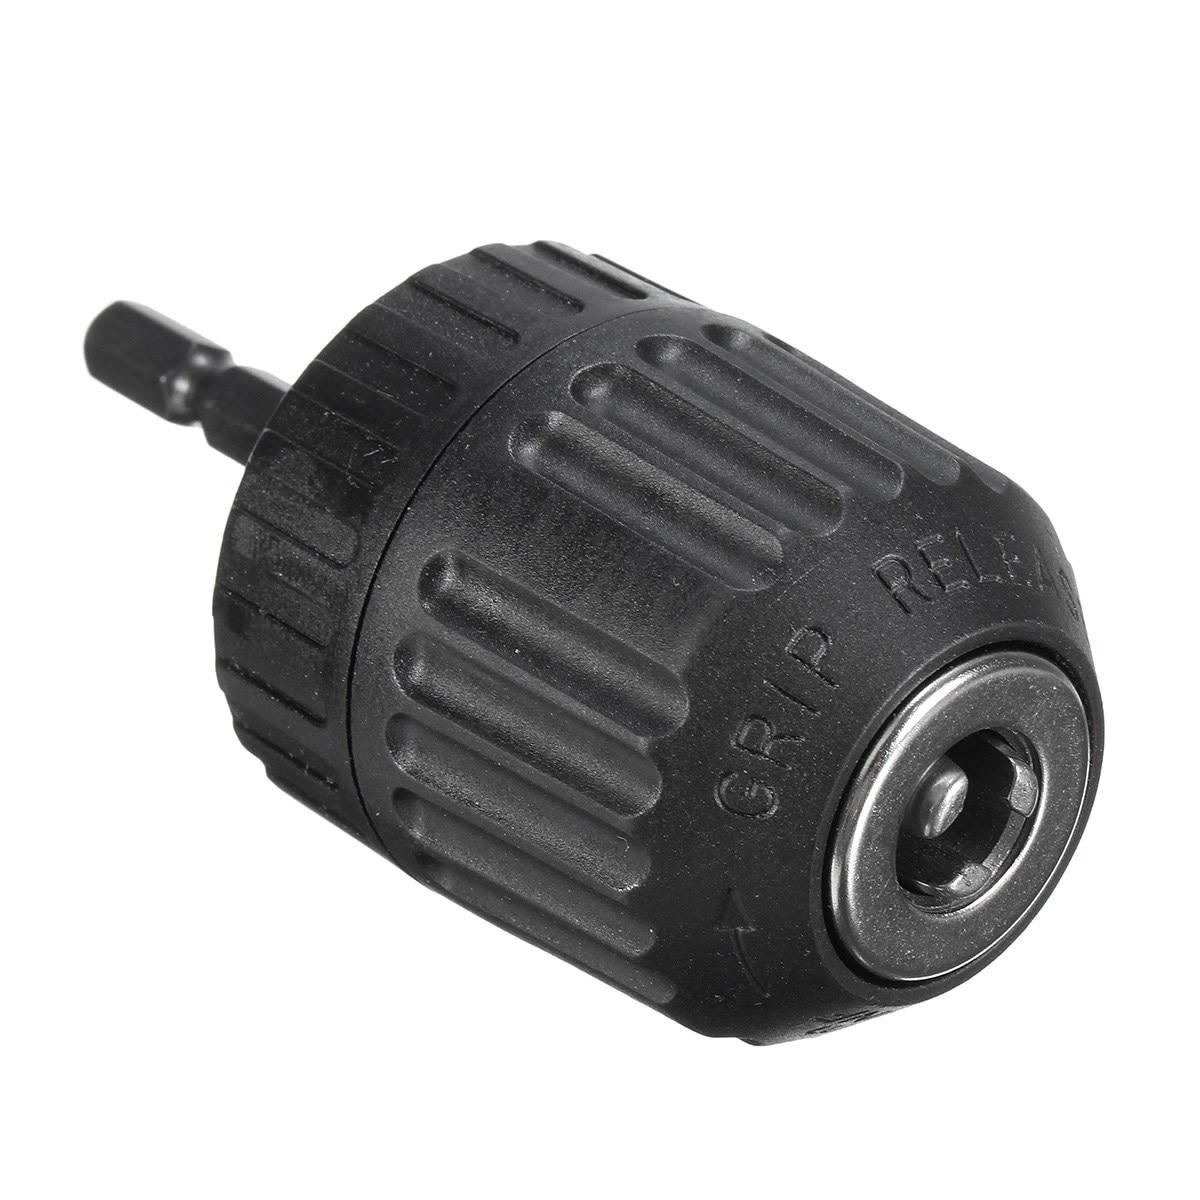 1PC 0.8-10mm Keyless Mini Drill Chuck Adaptor Converter 3/8 24UNF + 1/4 Hex Shank SDS Power Tool Accessories 0 3 6 5mm keyless drill chuck screwdriver 6 35mm hex shank drill bits impact driver adaptor chuck collect grinder converter